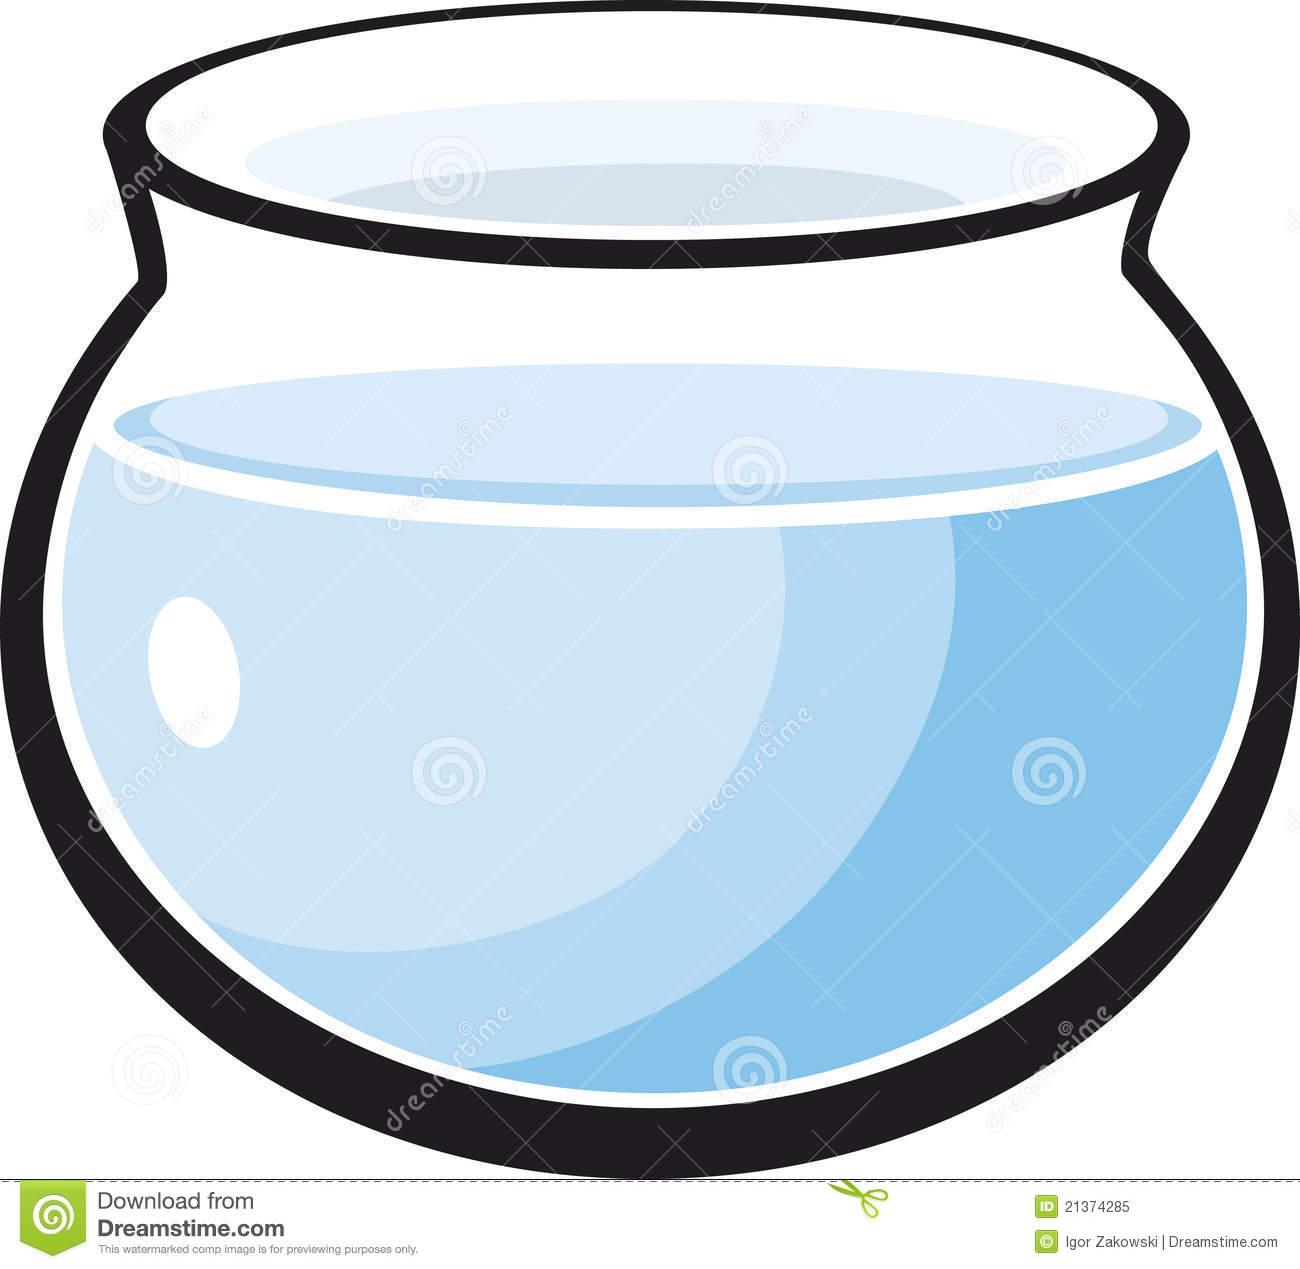 Empty bowl clip art clipart panda free clipart images for Empty fish tank